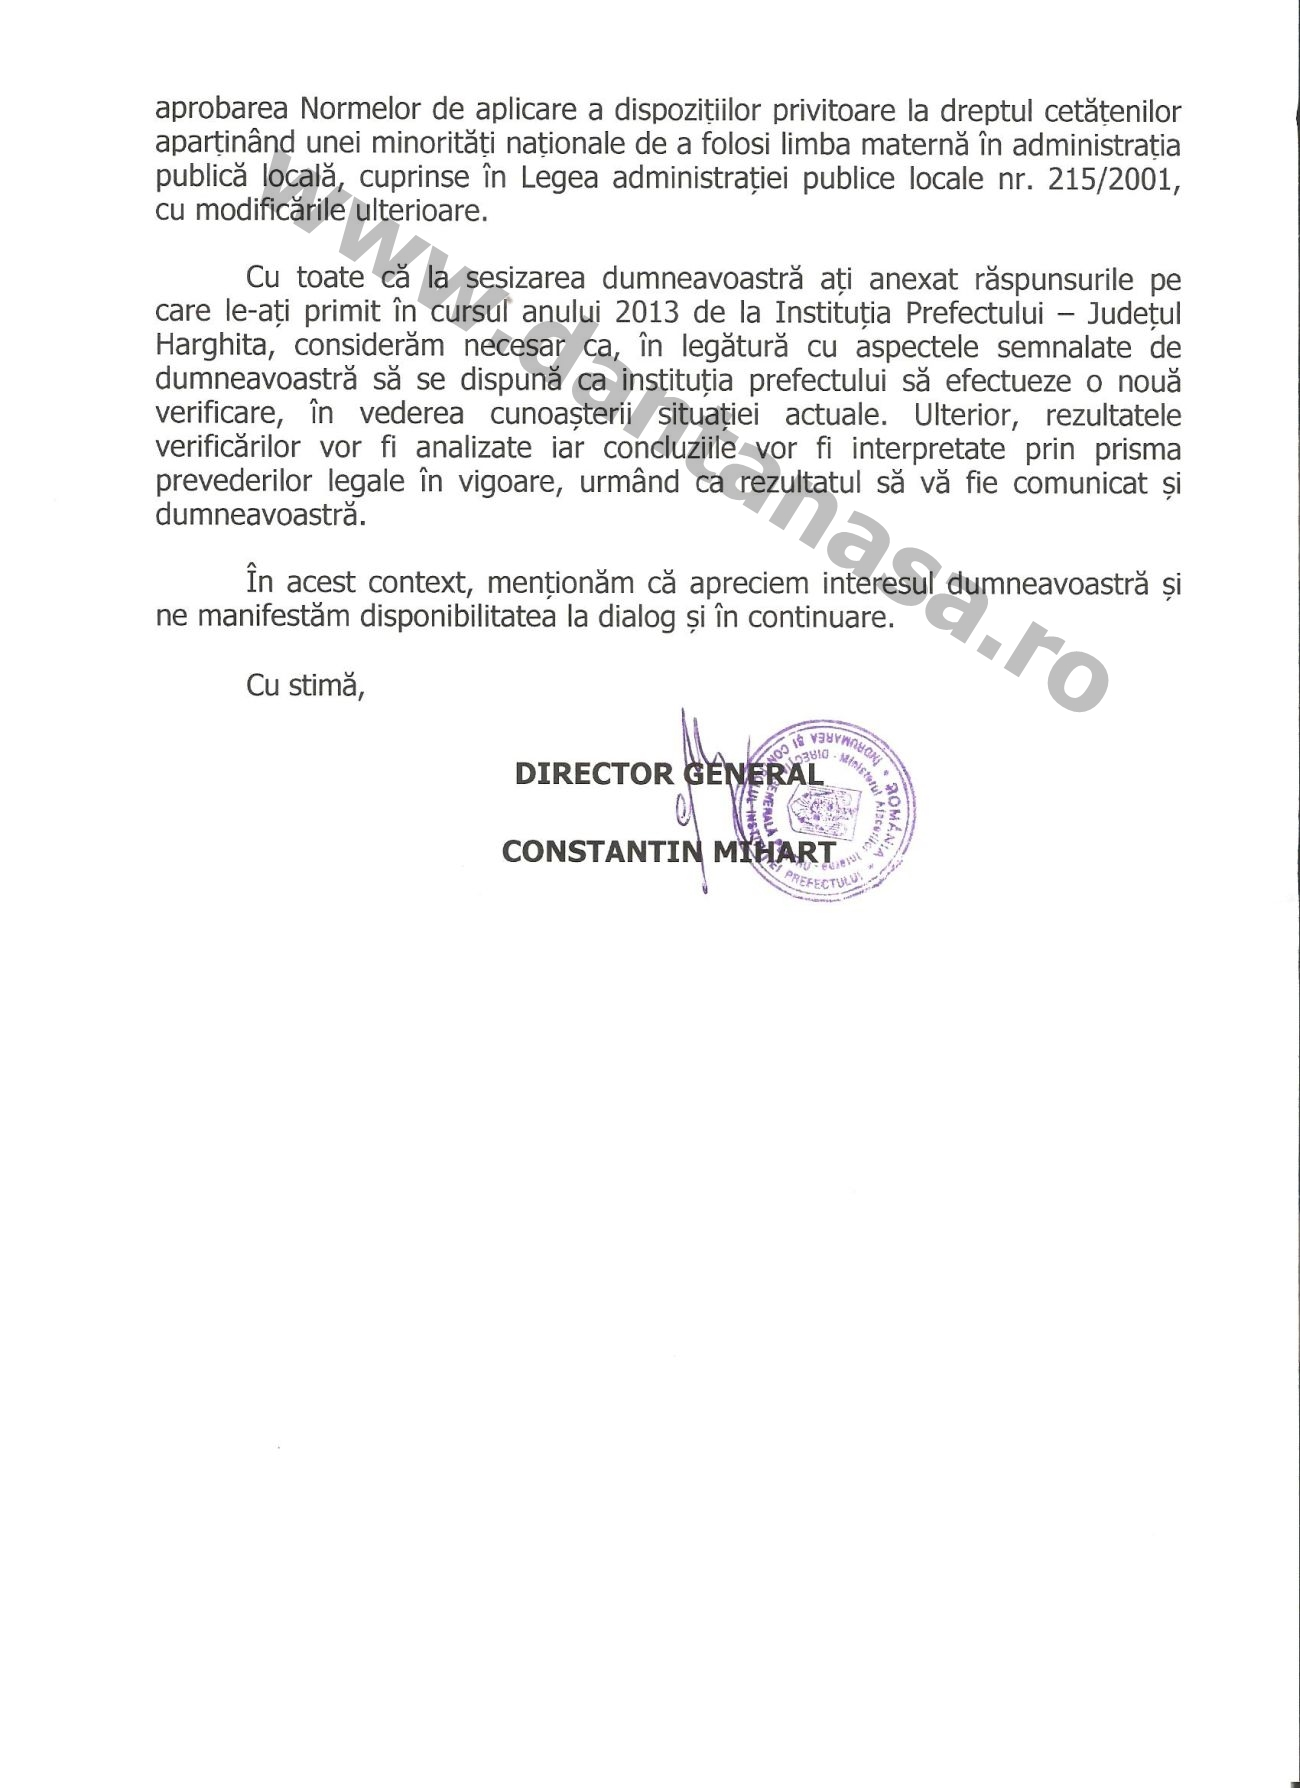 Ministerul Afacerilor Interne Constantin Mihart Nyiro Jozsef Wass Albert Dan Tanasa 2